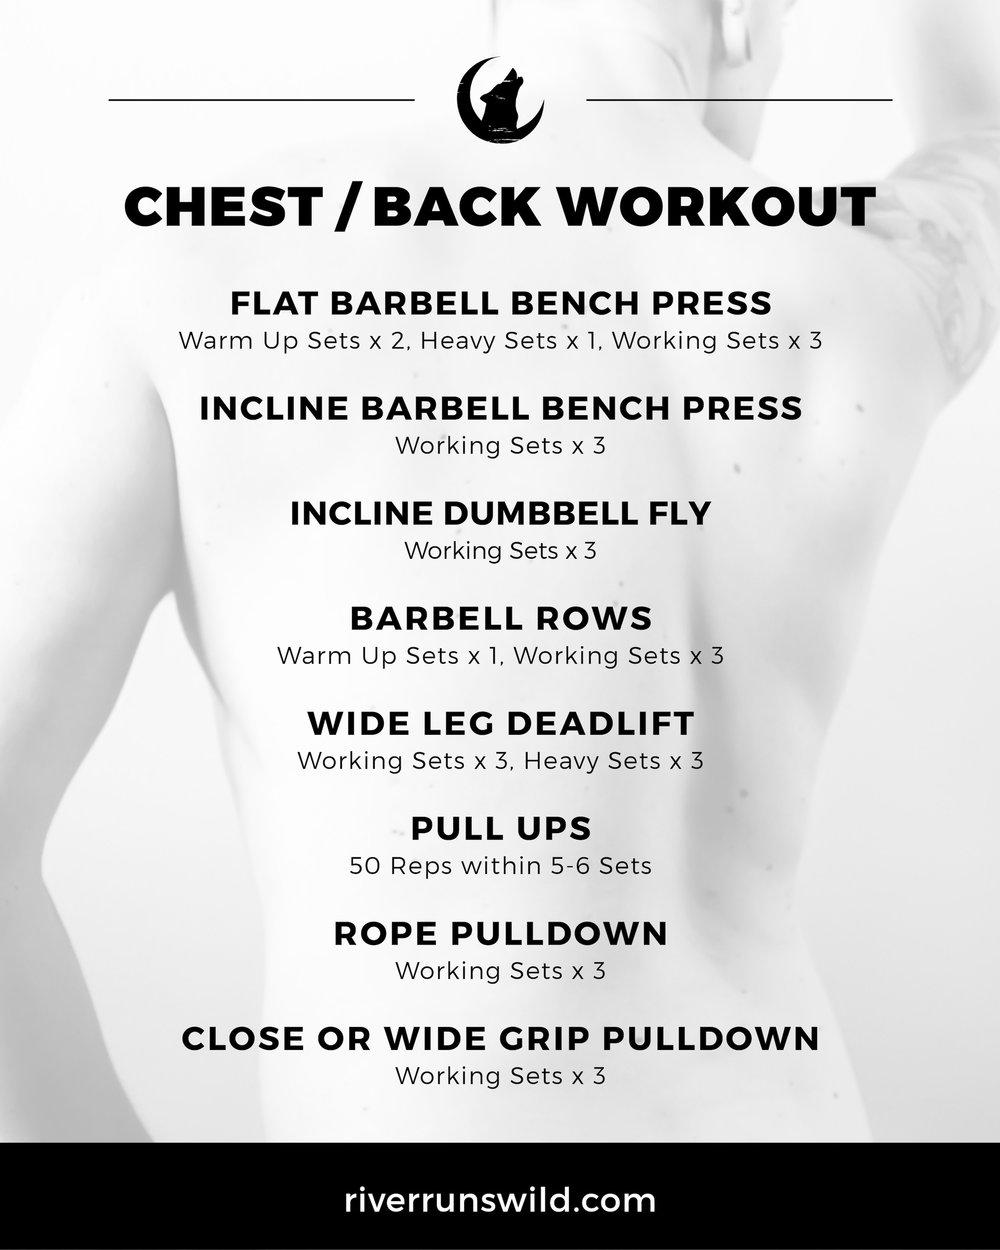 River-Runs-Wild-FTM-Fitness-Bodybuilding-Trans-Man-Transgender-Transition-Bulking-Muscle-Size-Get-Big-Grow-Strength-Lifting-Workout